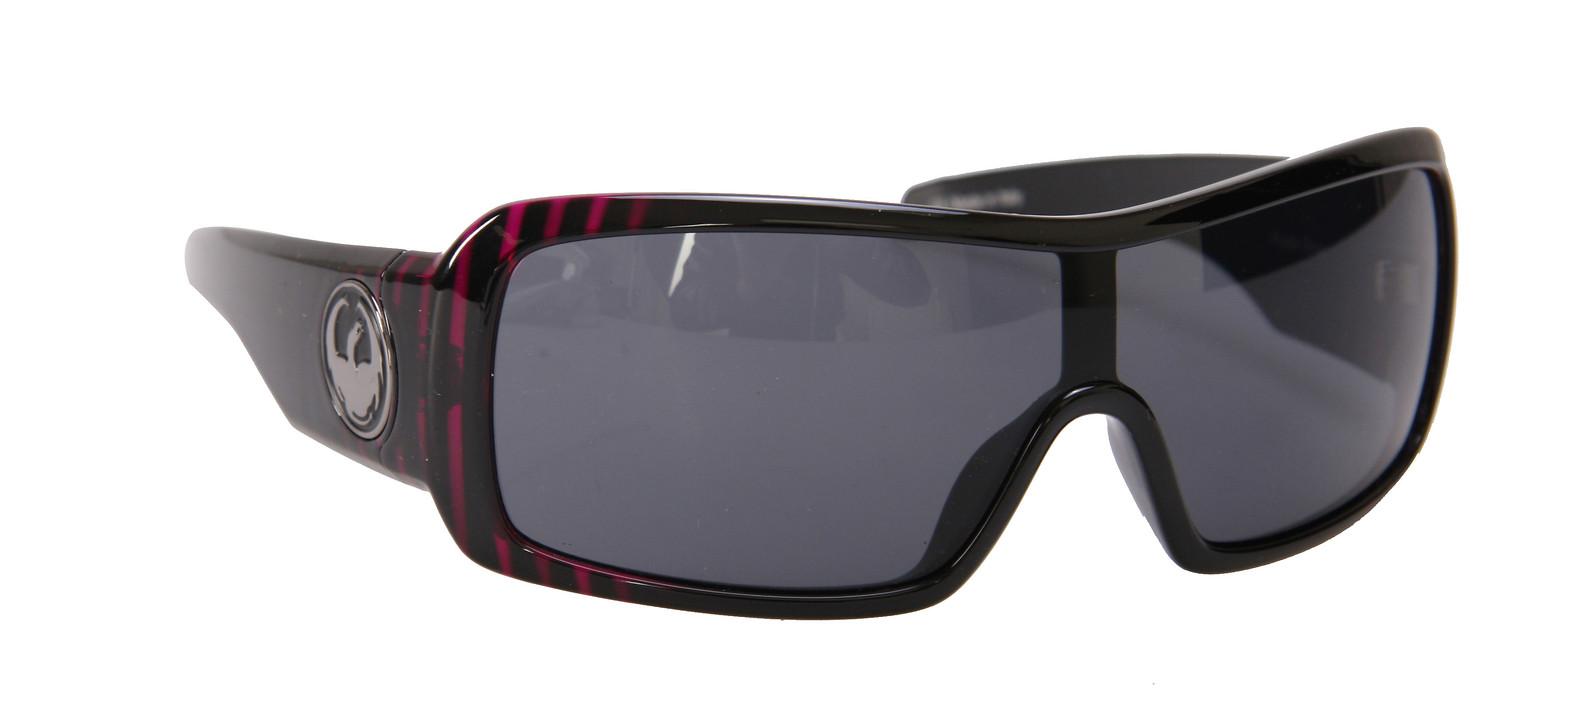 Dragon Phase Sunglasses Jet/Purple Stripe/Grey Lens  dragon-phase-sngls-prplstrpgry-09.jpg